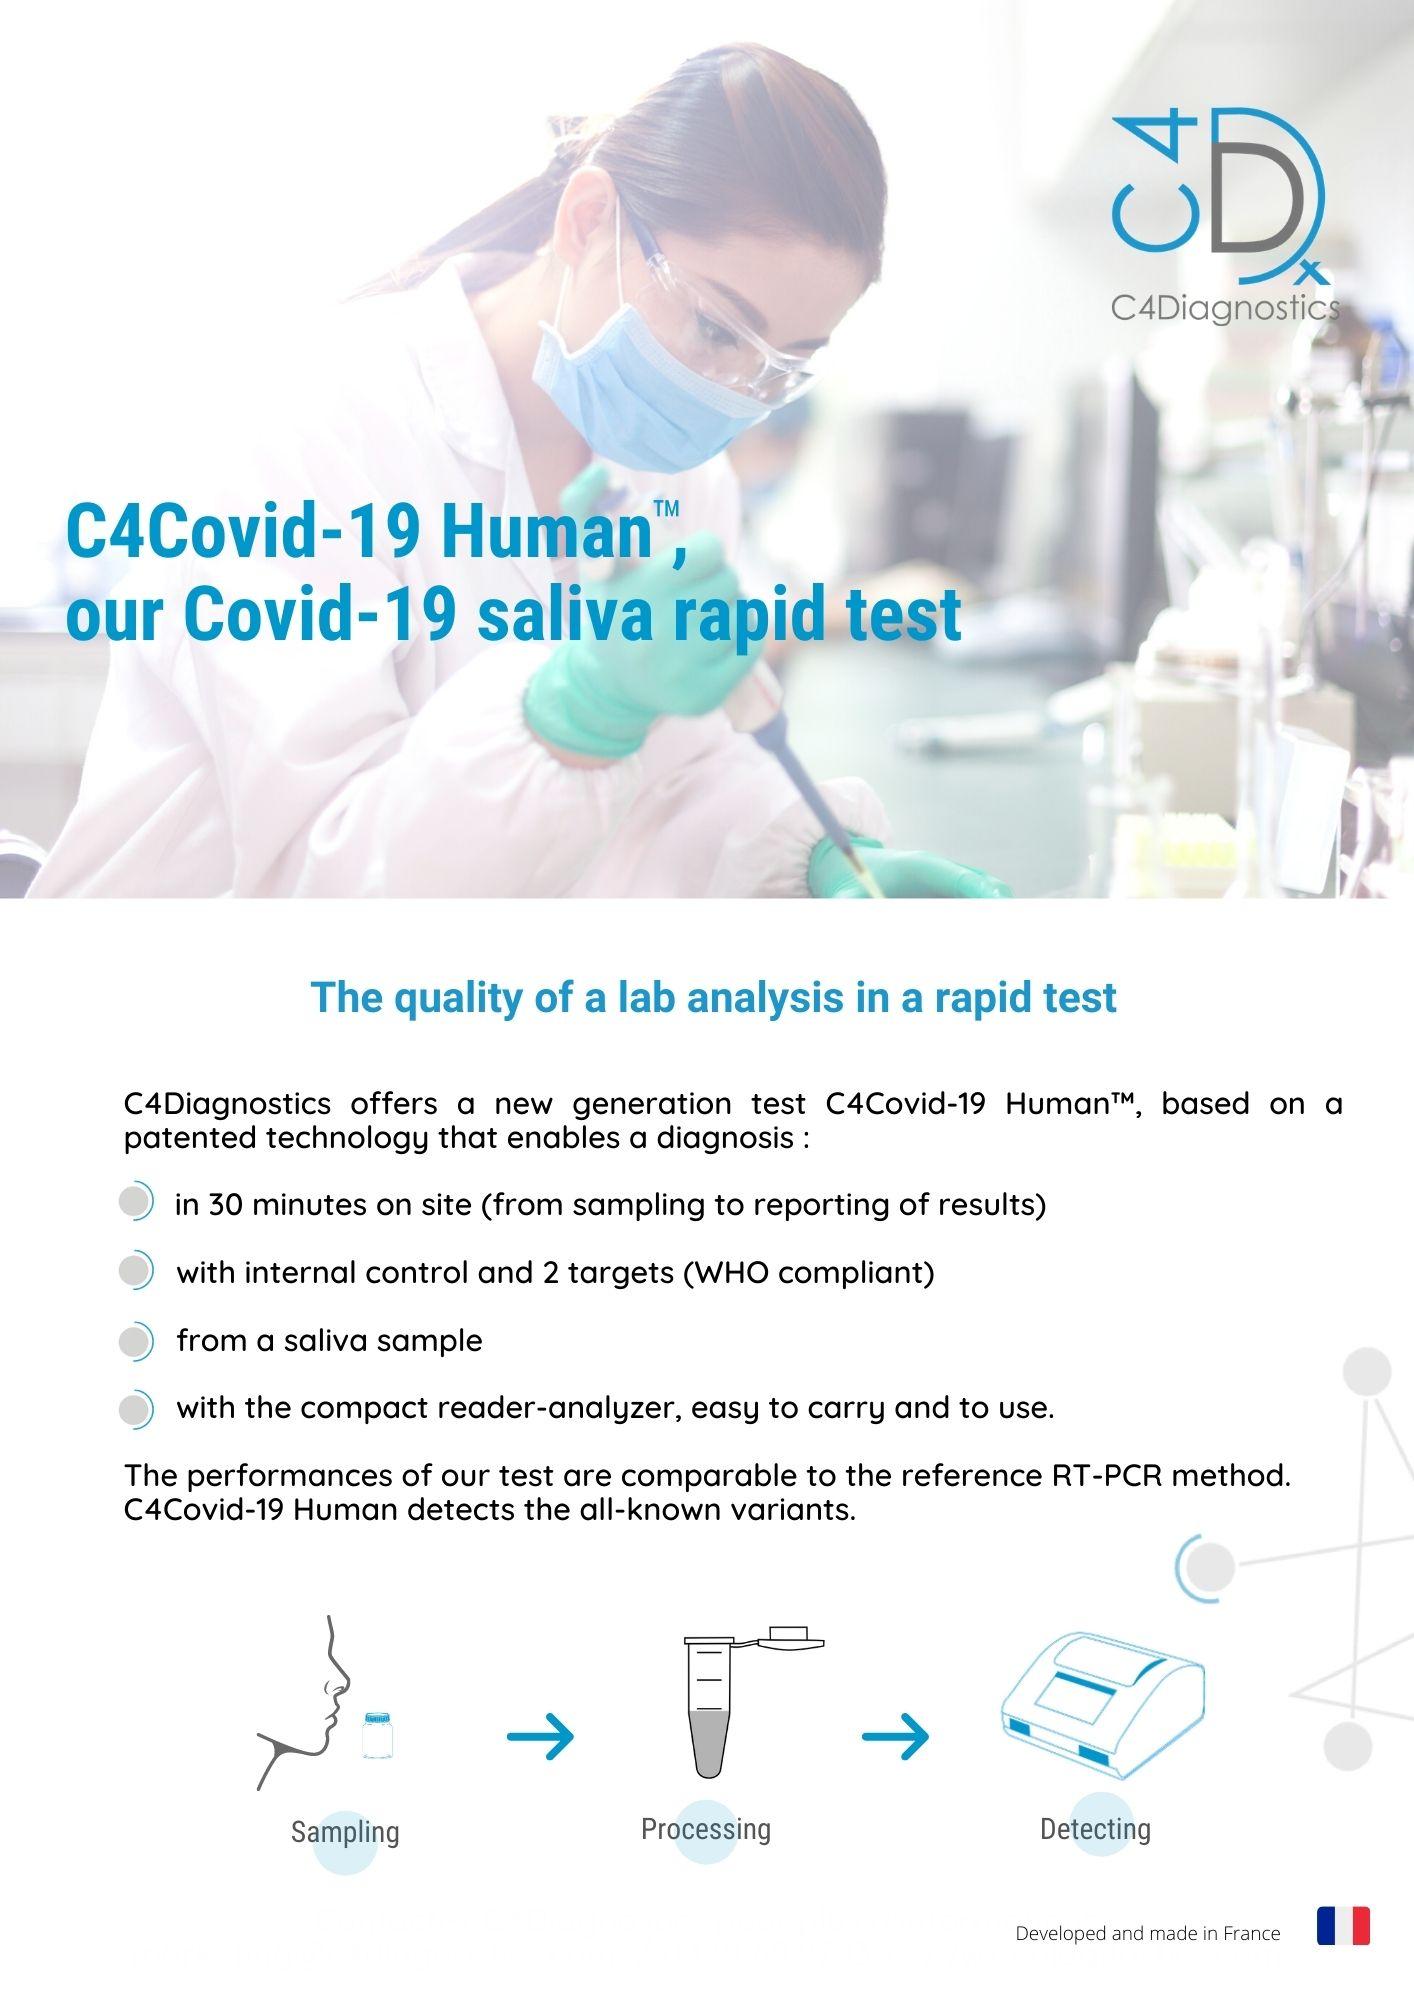 C4Covid-19 Human, our rapid salivary test